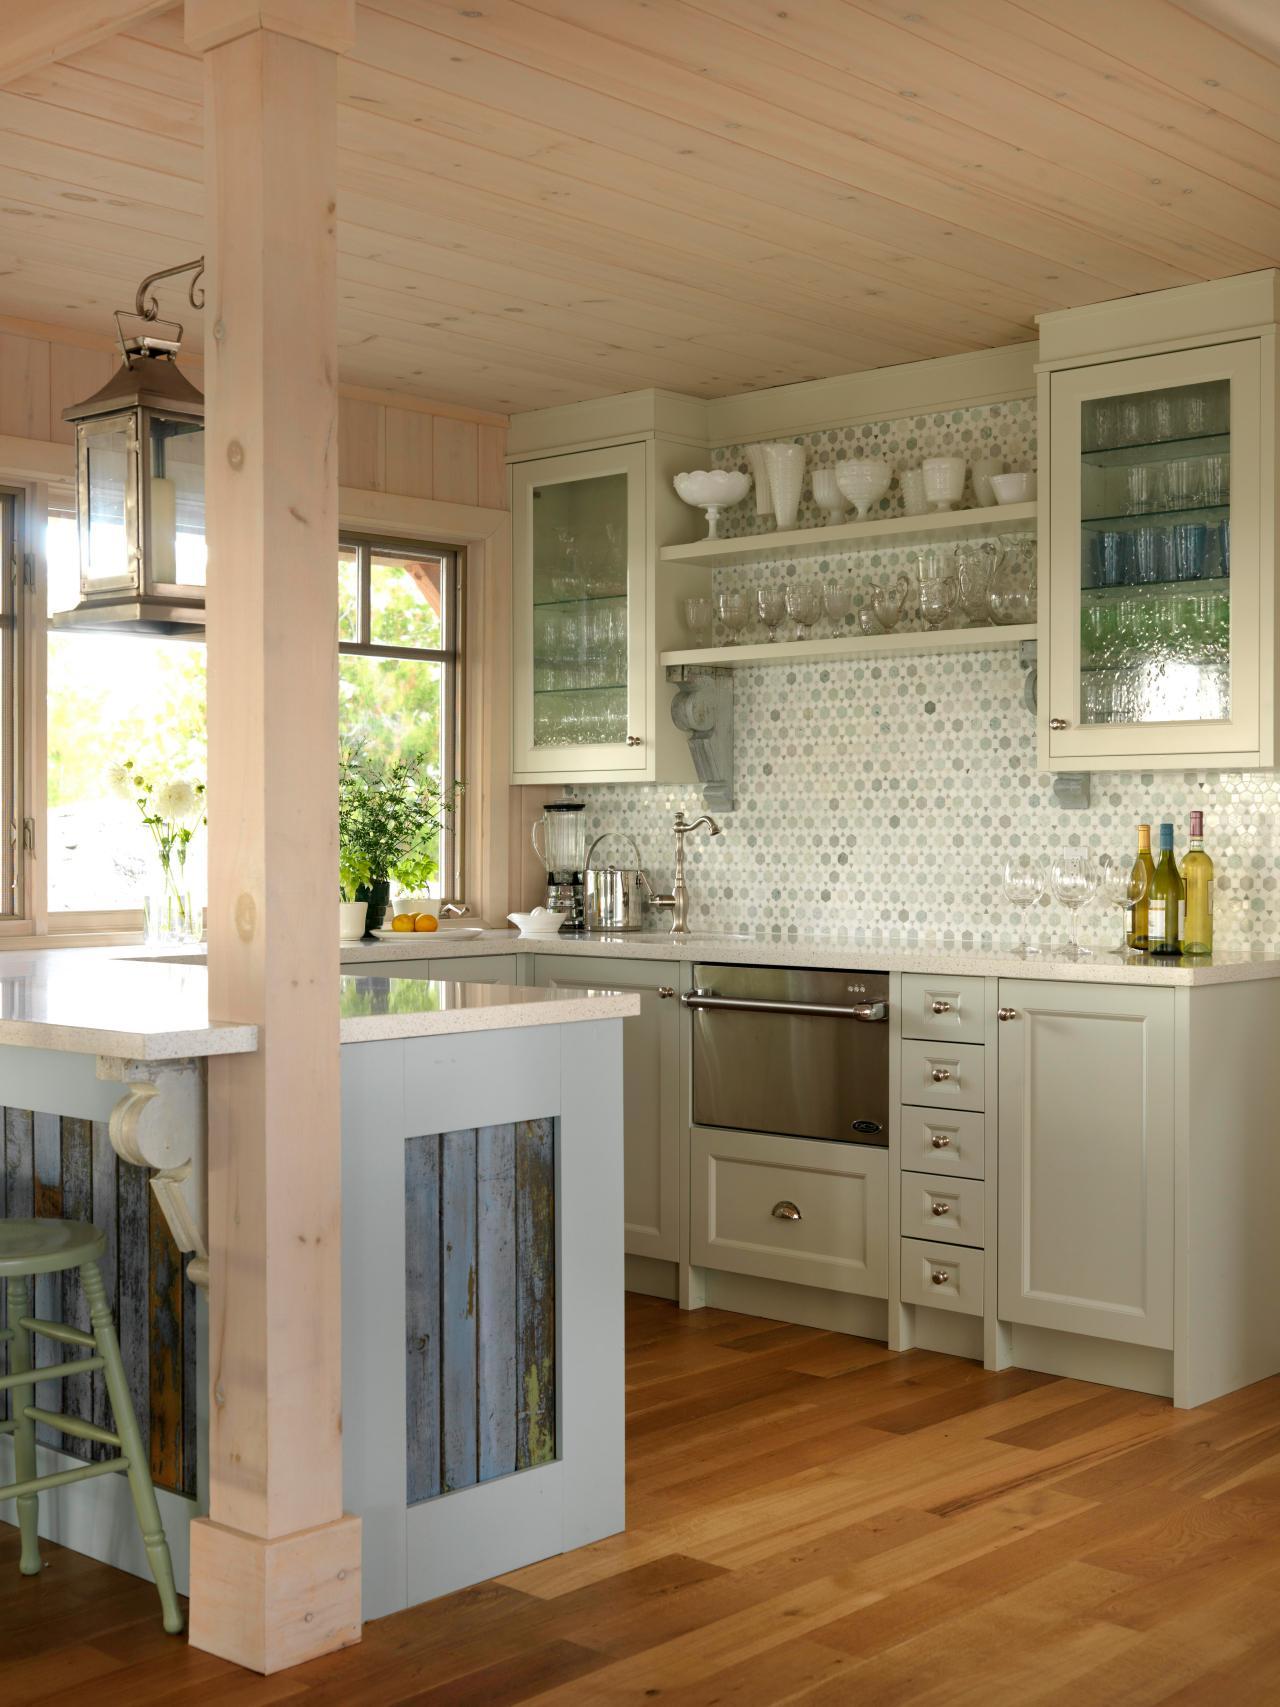 kitchen cabinet ideas beach house photo - 7